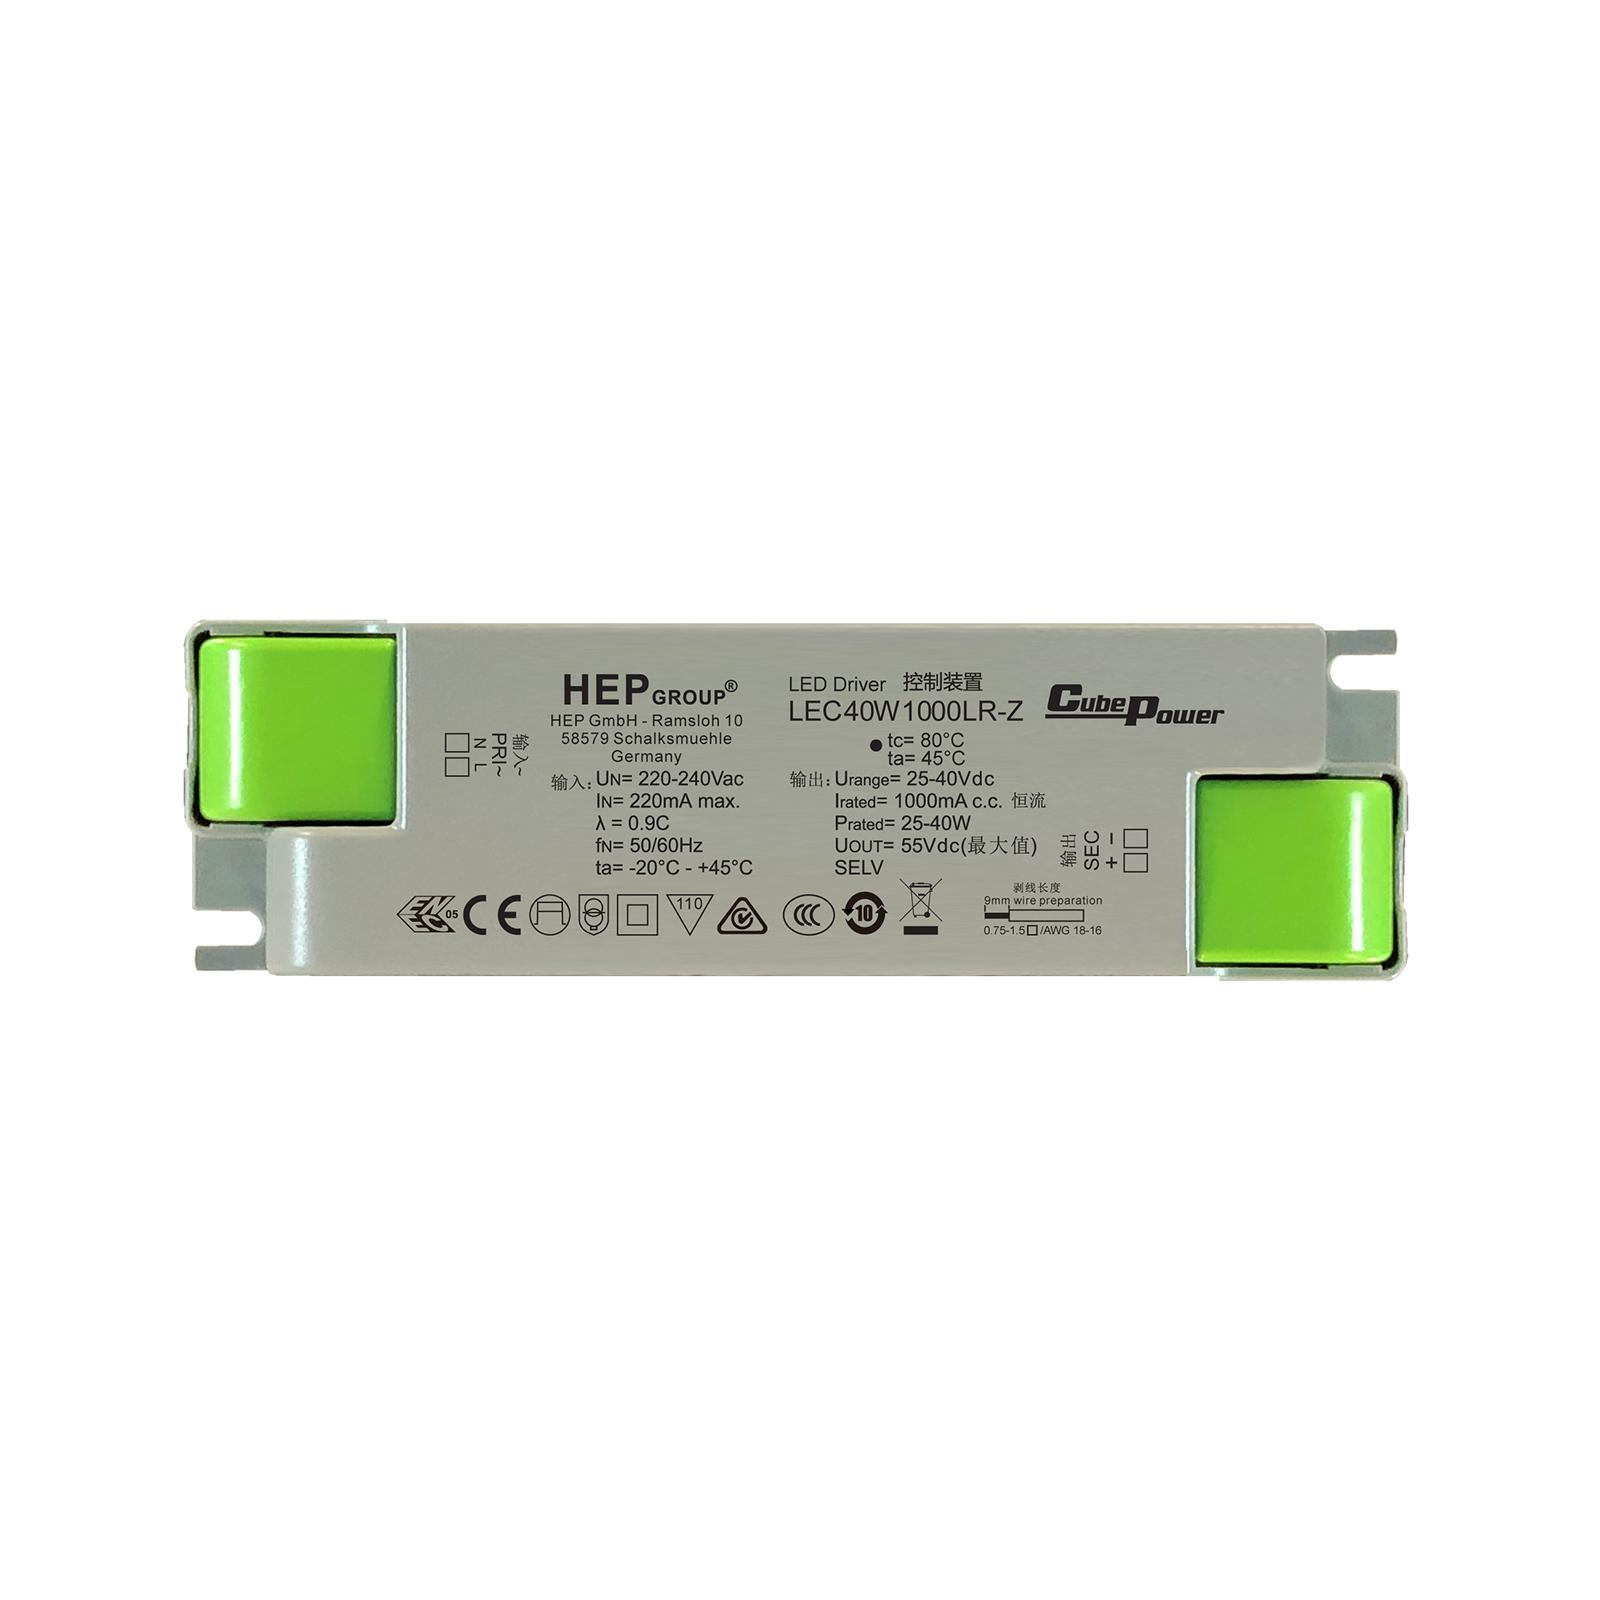 LED-driver LEC, 40 W, 1000 mA, CC